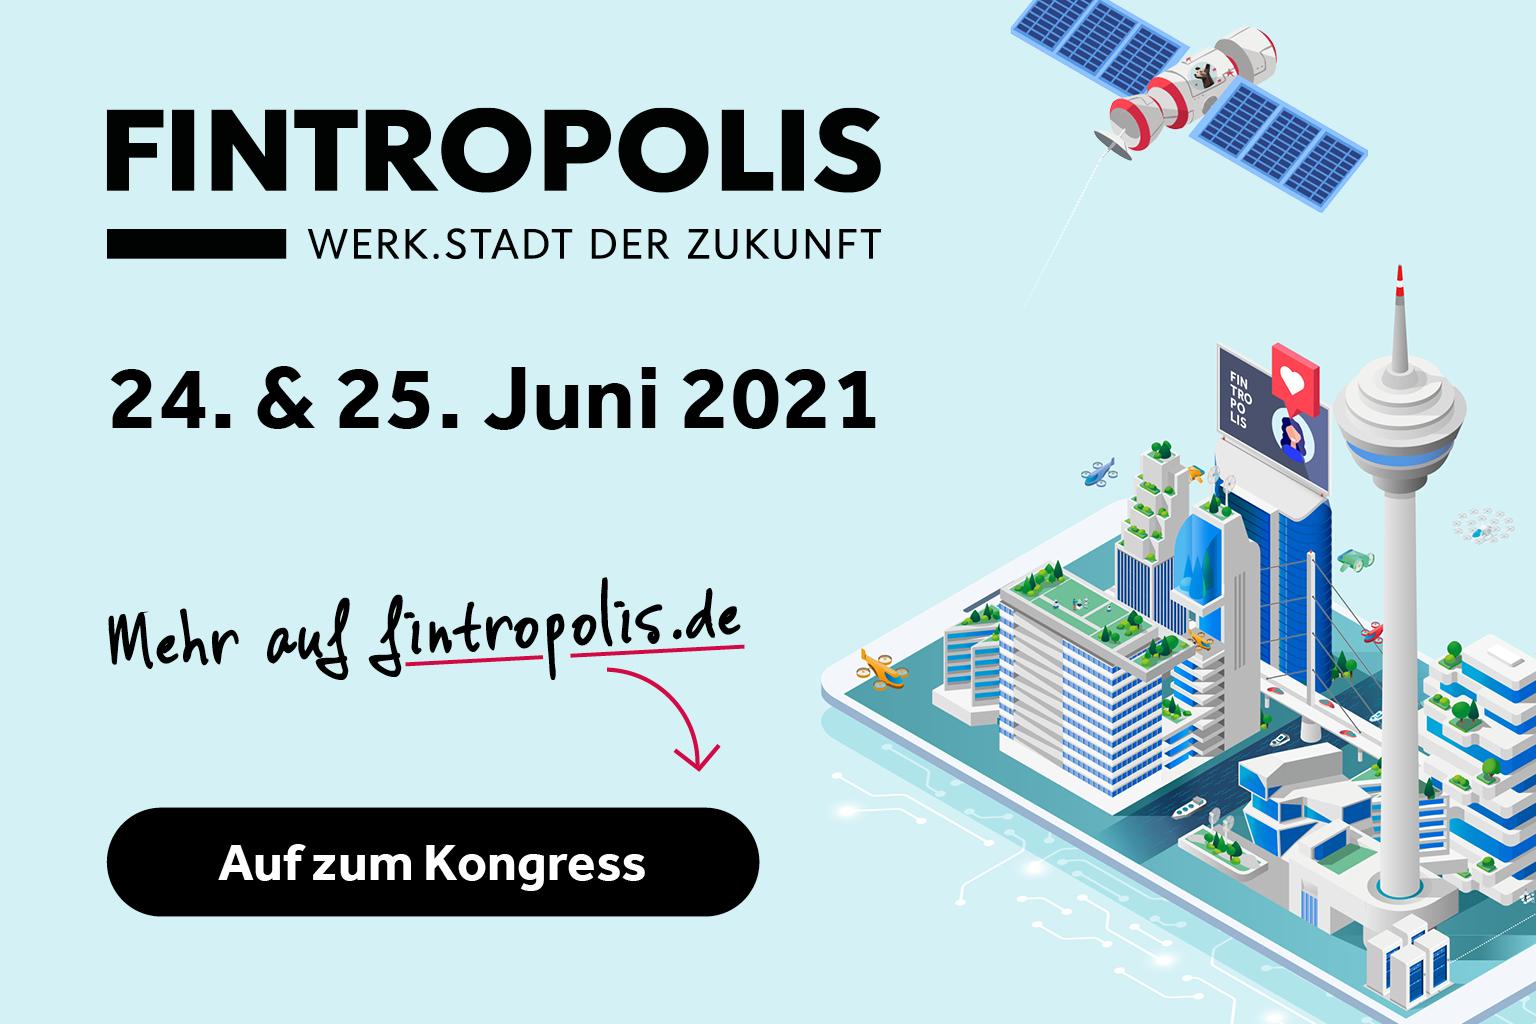 https://www.fintropolis.de/event/speakers